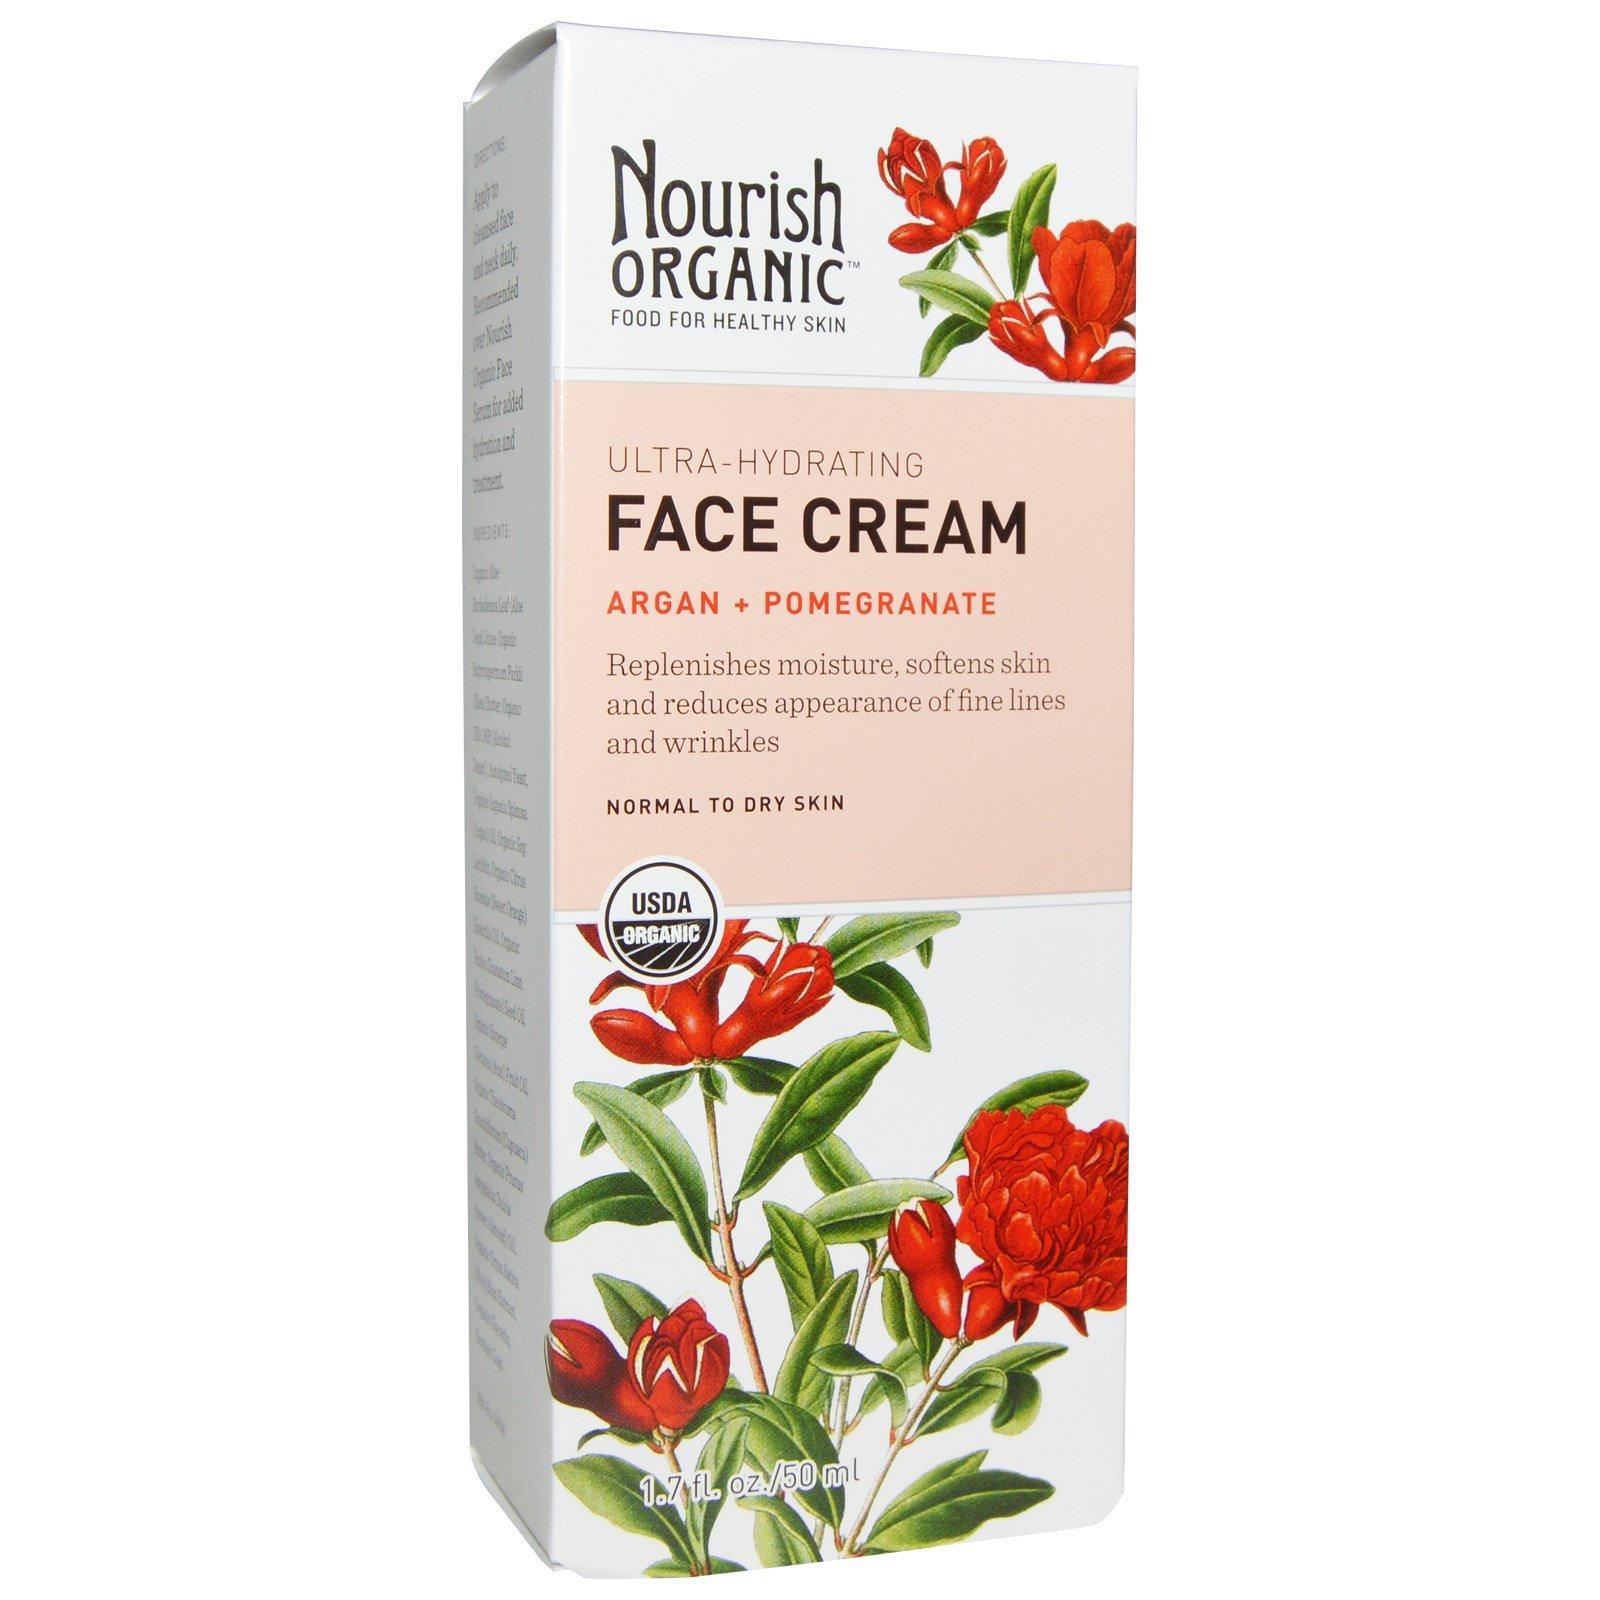 Nourish Organic, Крем для лица, Арган + гранат, 1,7 унции (50 мл)